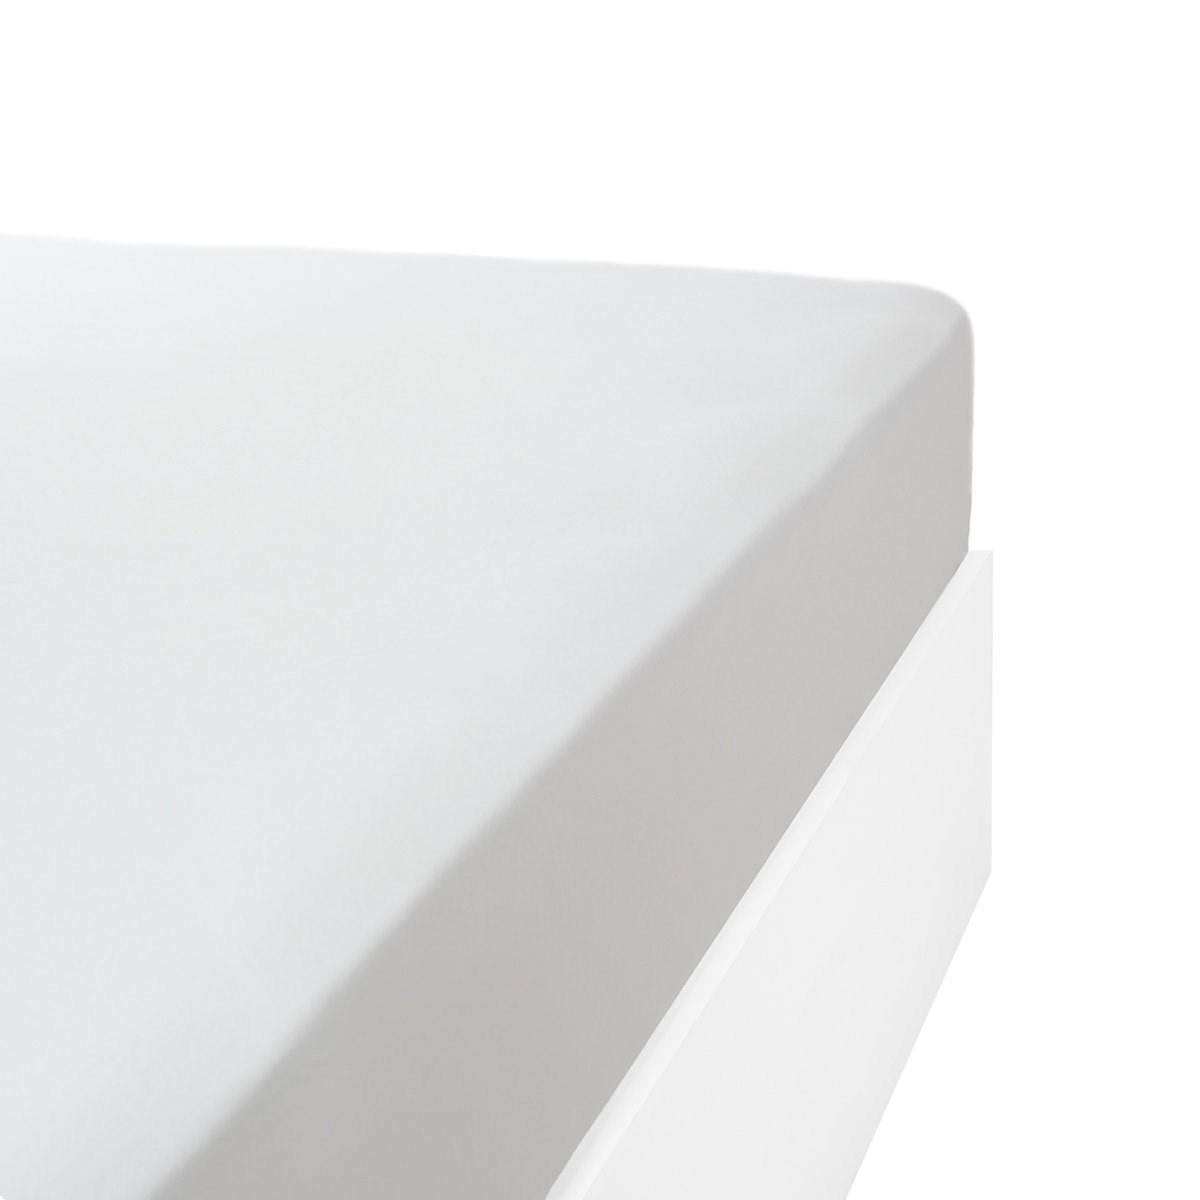 Drap housse jersey extensible en coton blanc 120x190 cm